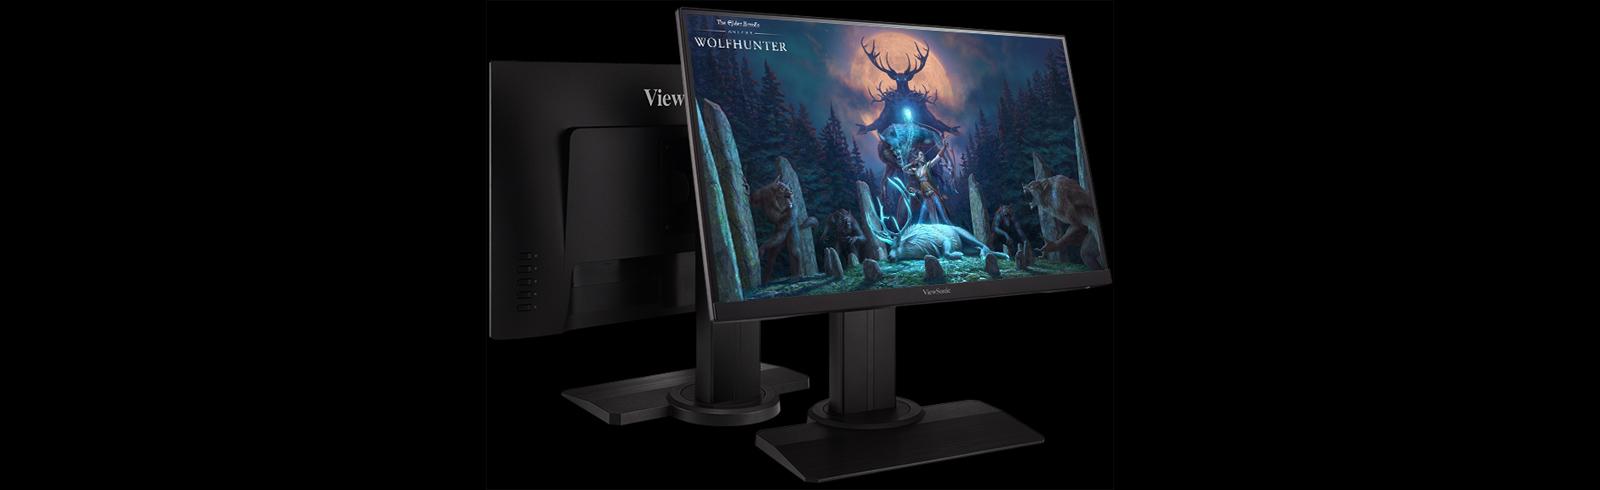 ViewSonic Elite XG2405 makes gaming more affordable